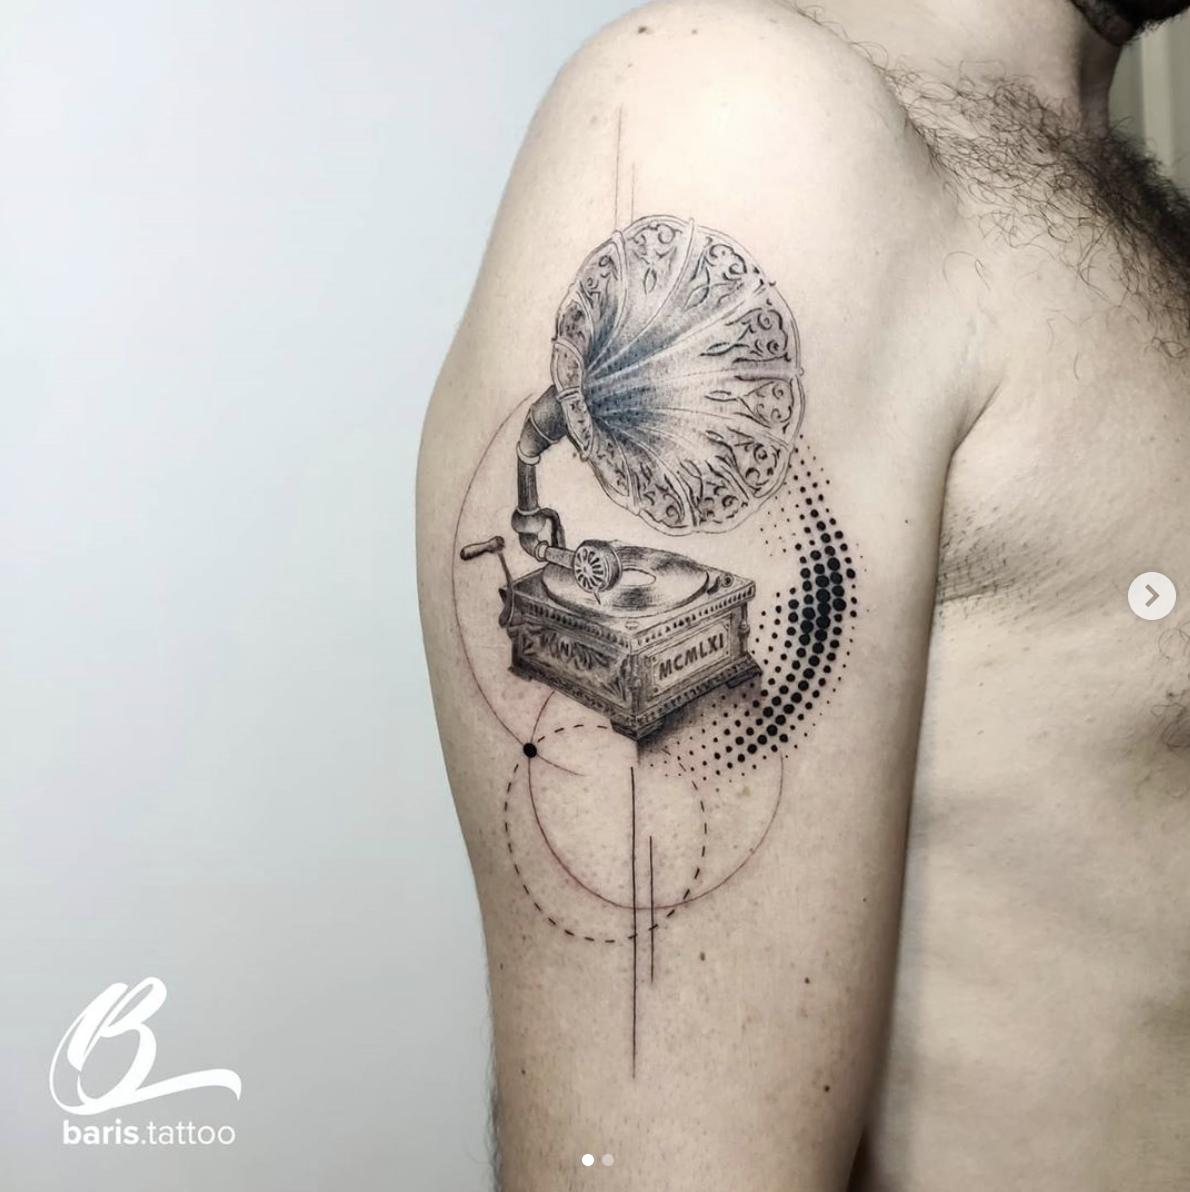 Inksearch tattoo Barış Öztekin